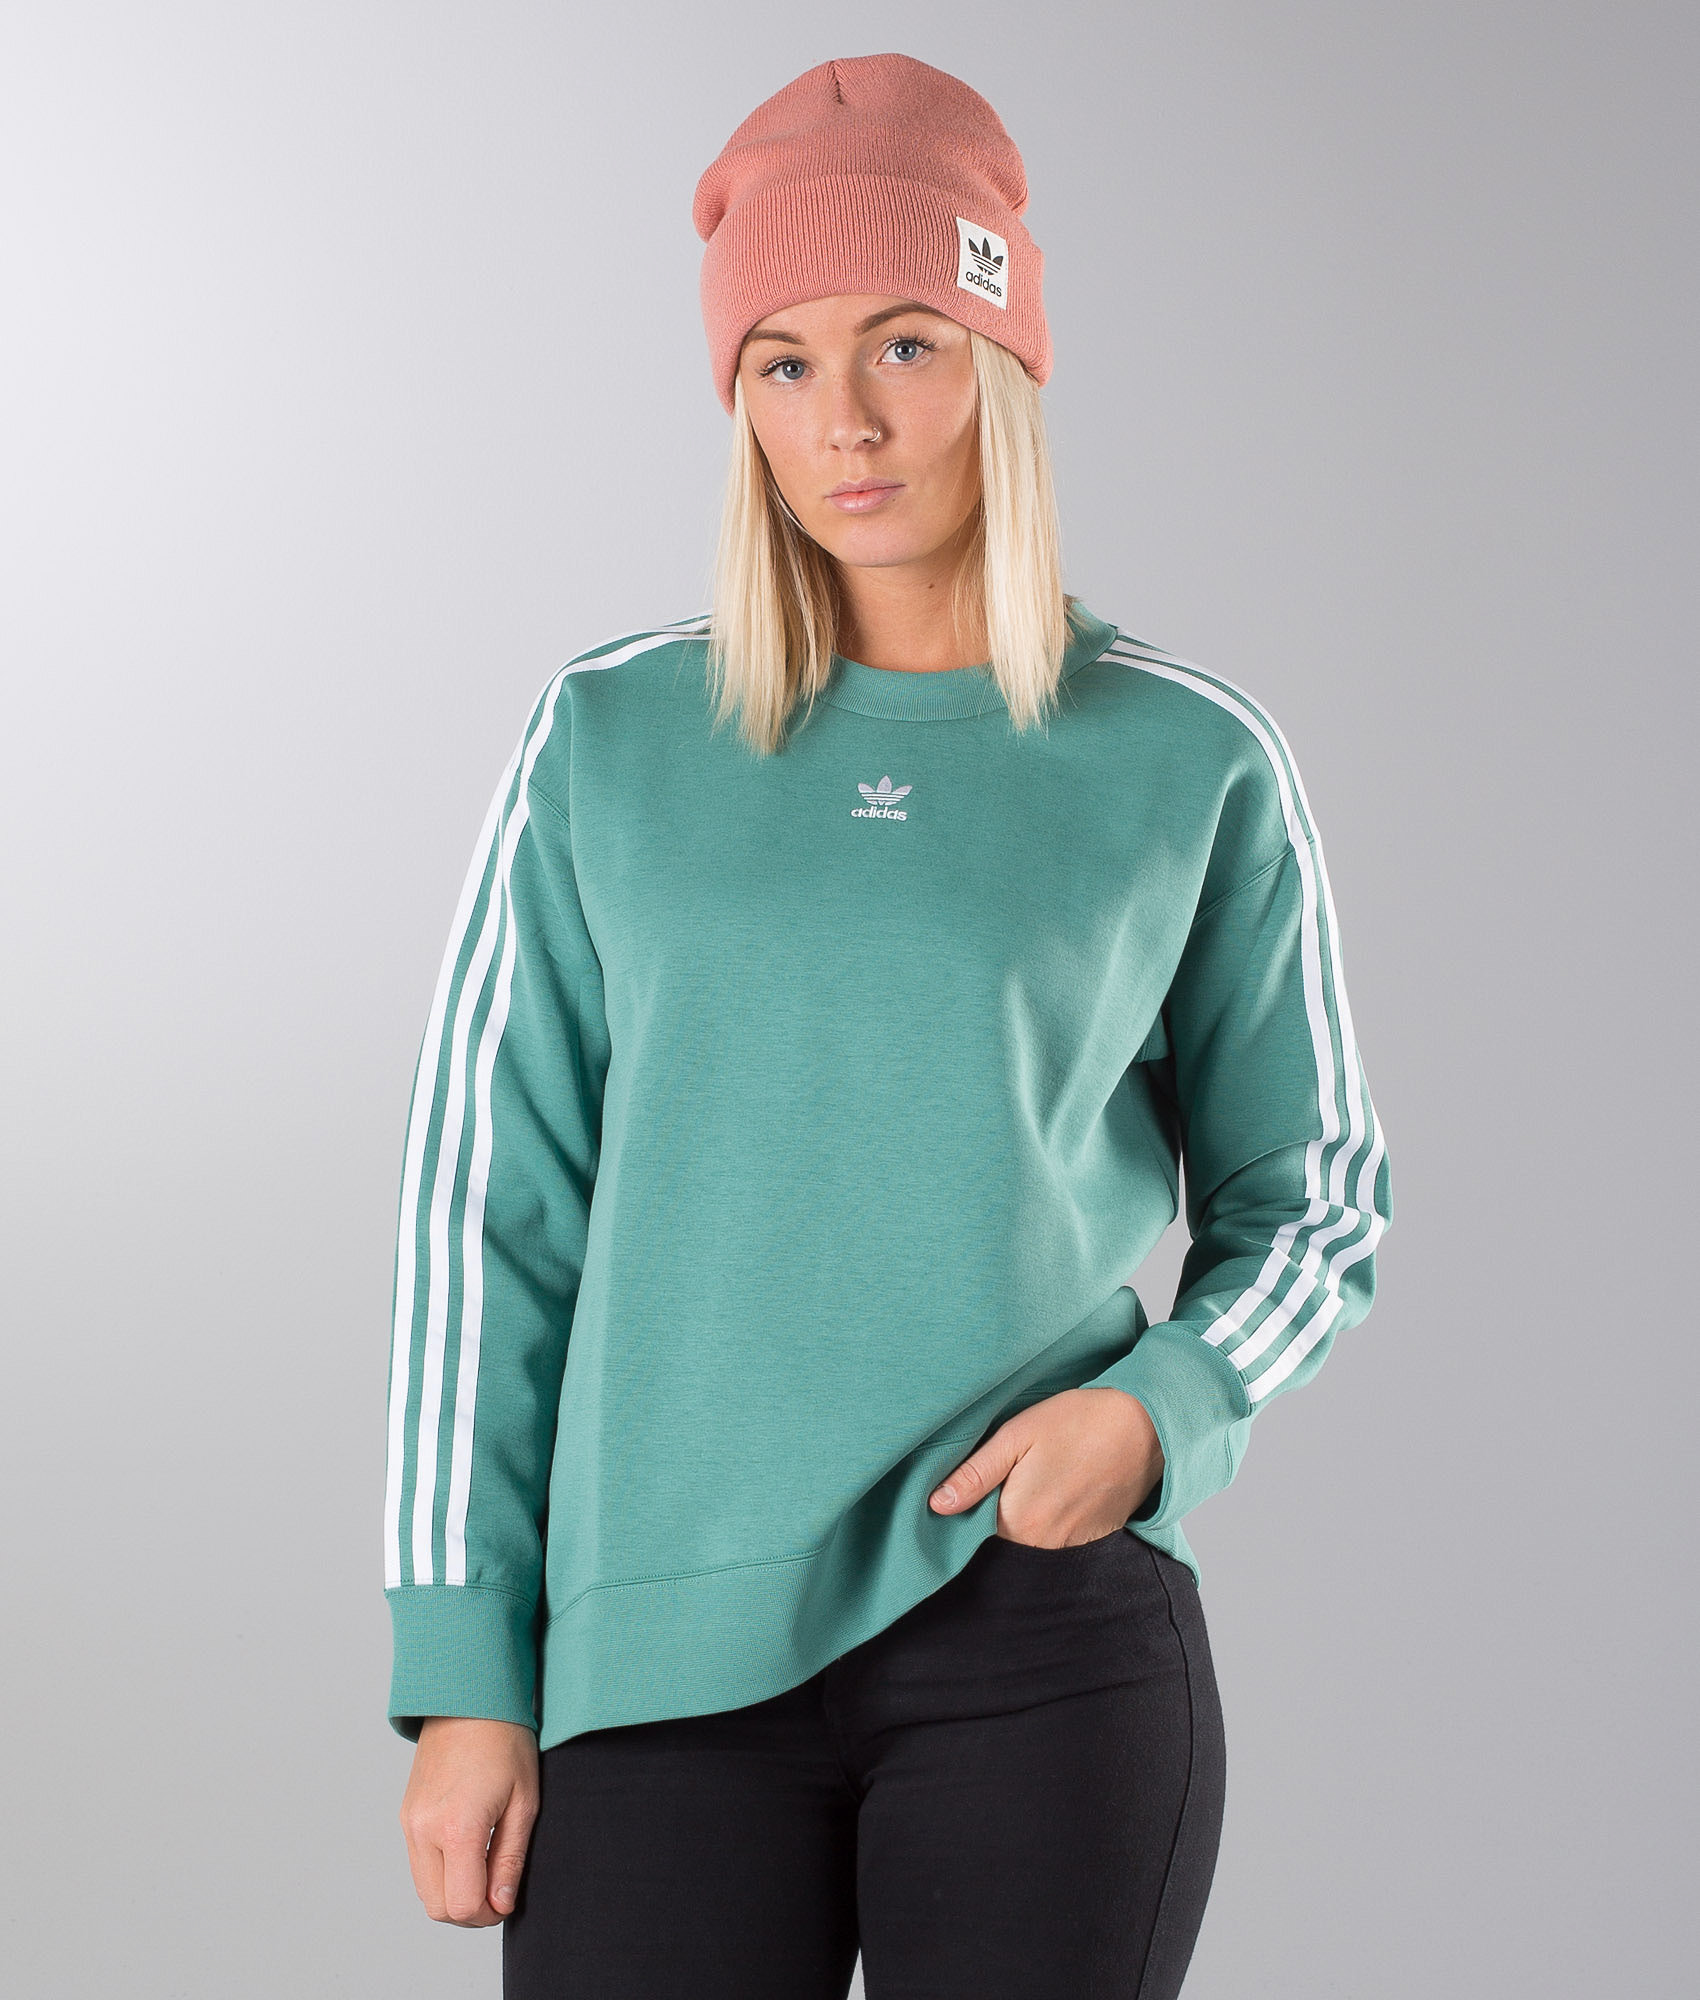 16dbc457 Adidas Originals Crew Sweater Future Hydro - Ridestore.com